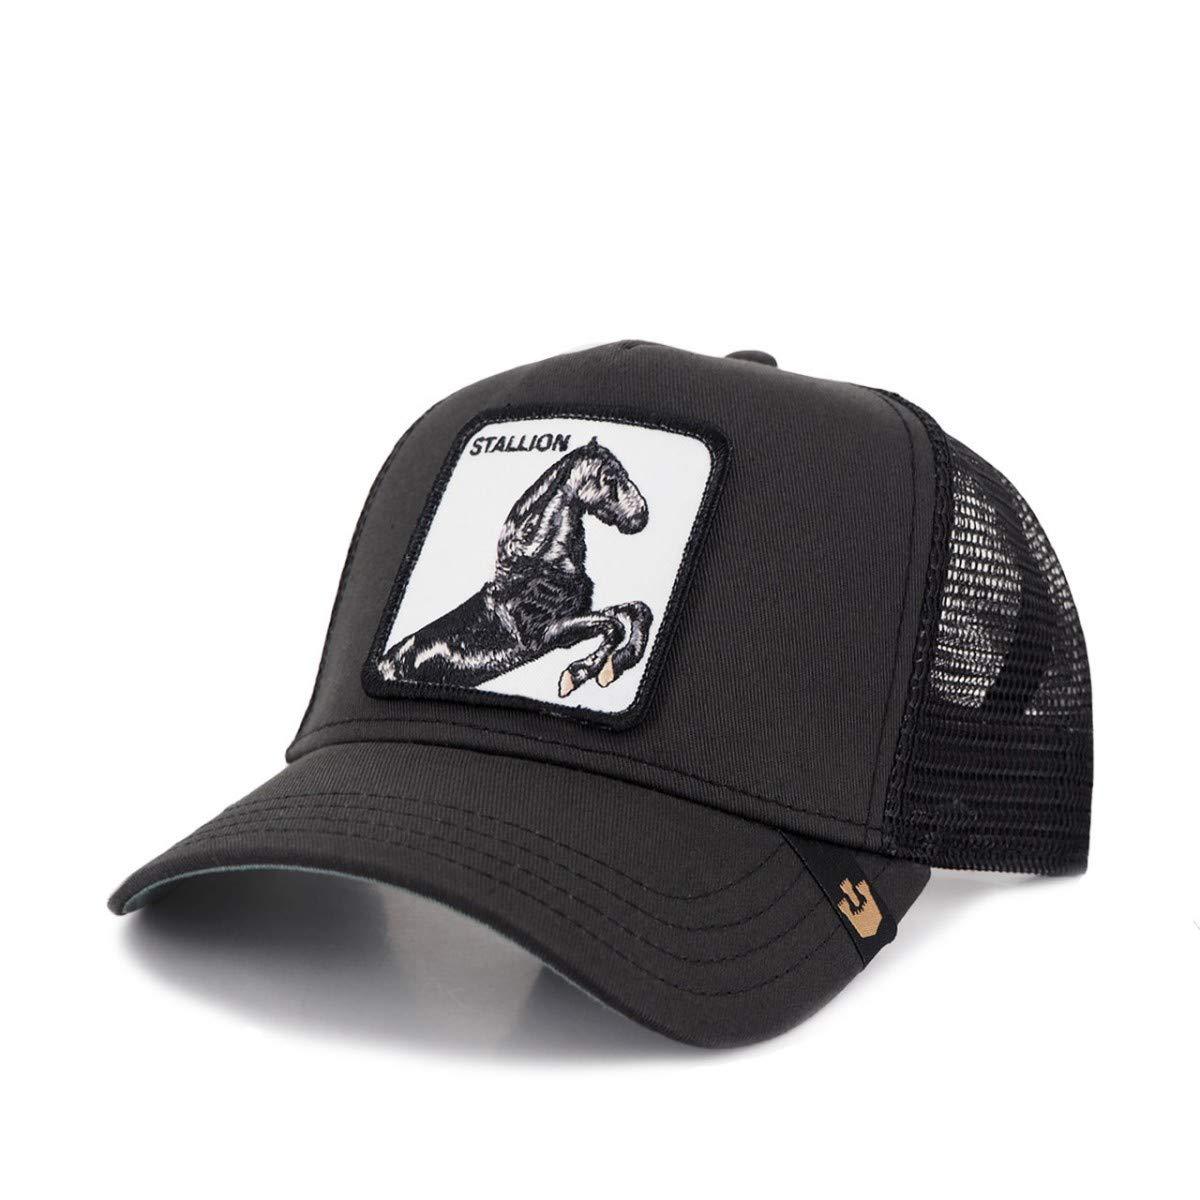 Goorin Bros. Cappello da Baseball Stallion GOB/_101-9991-BLK